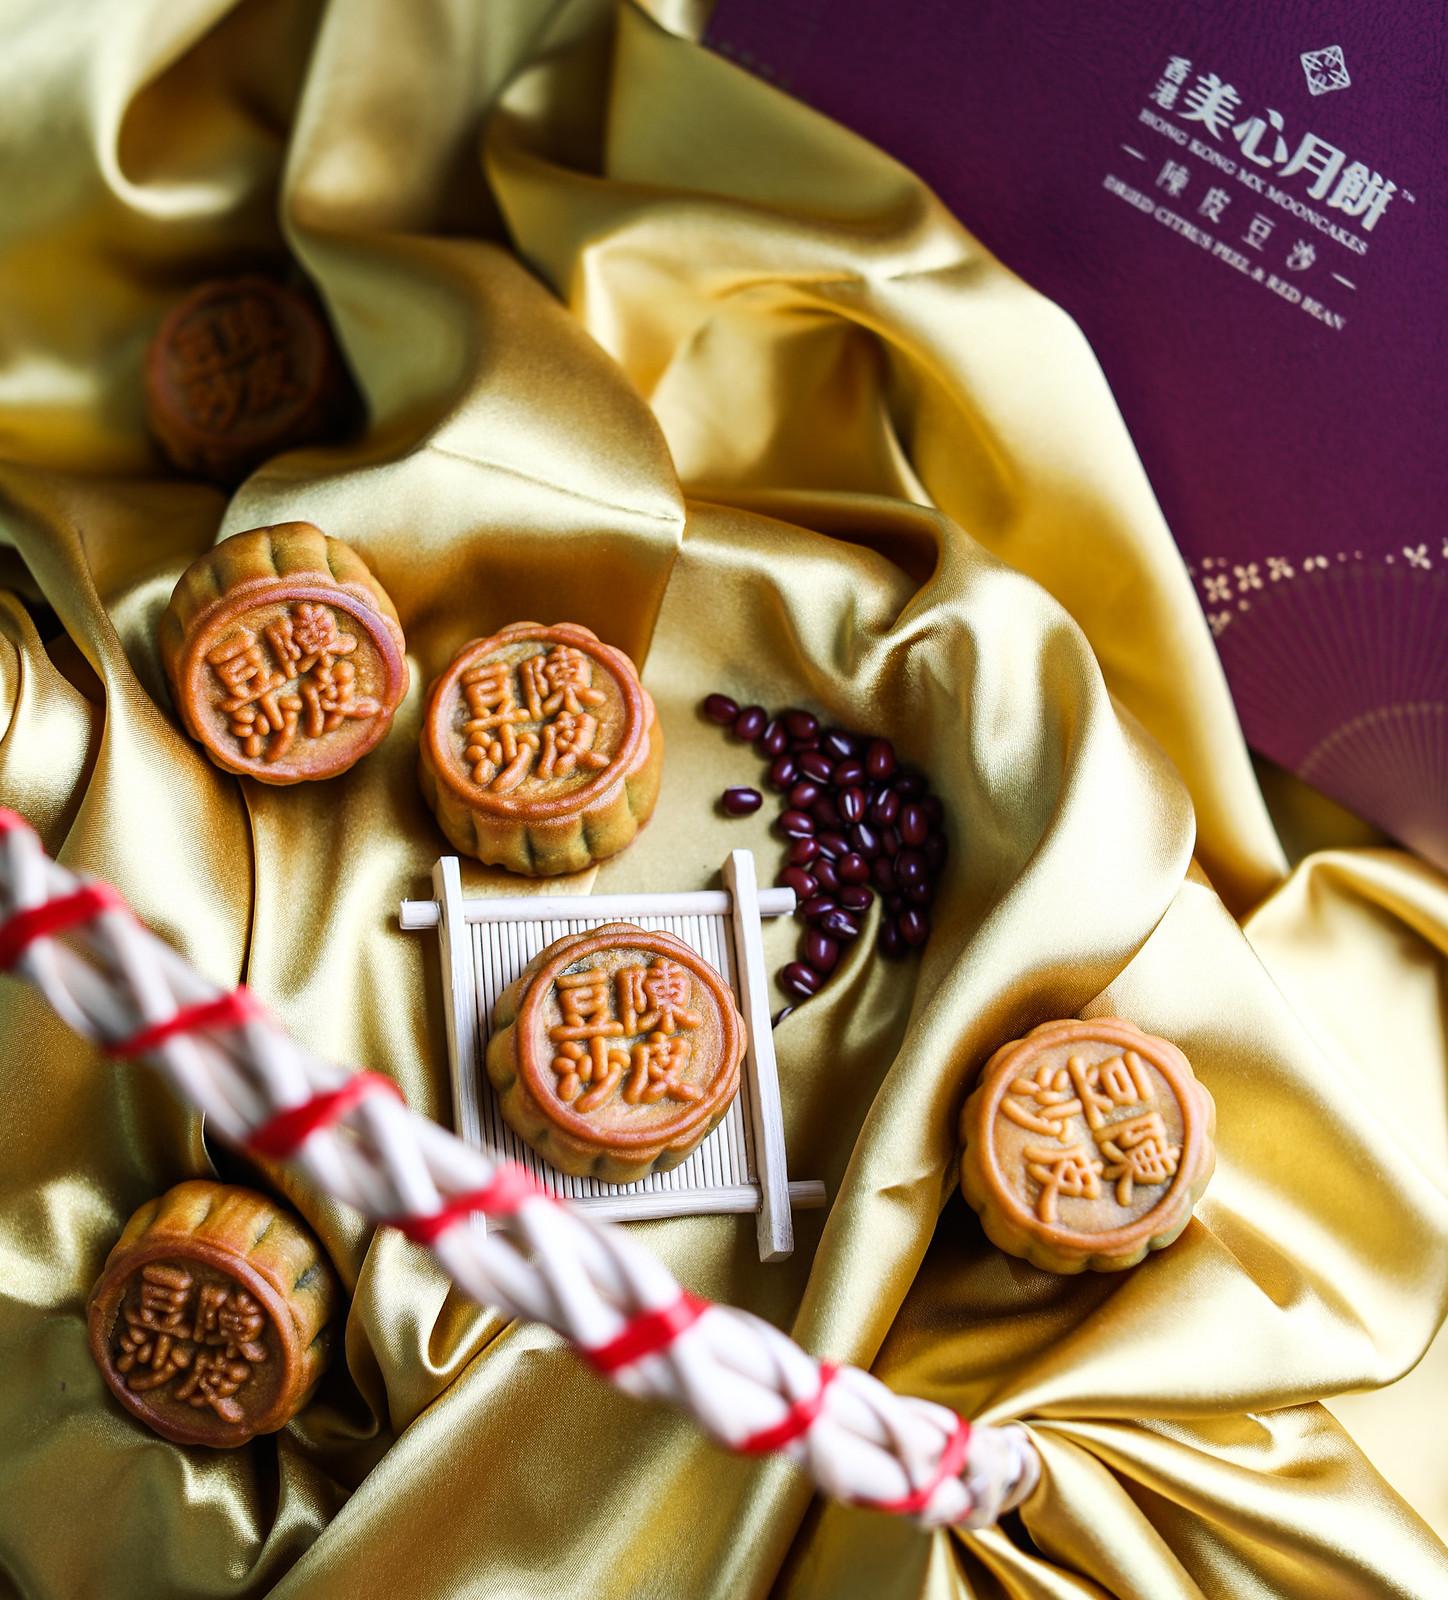 Hong Kong Mei-Xin Mooncakes: Citrus